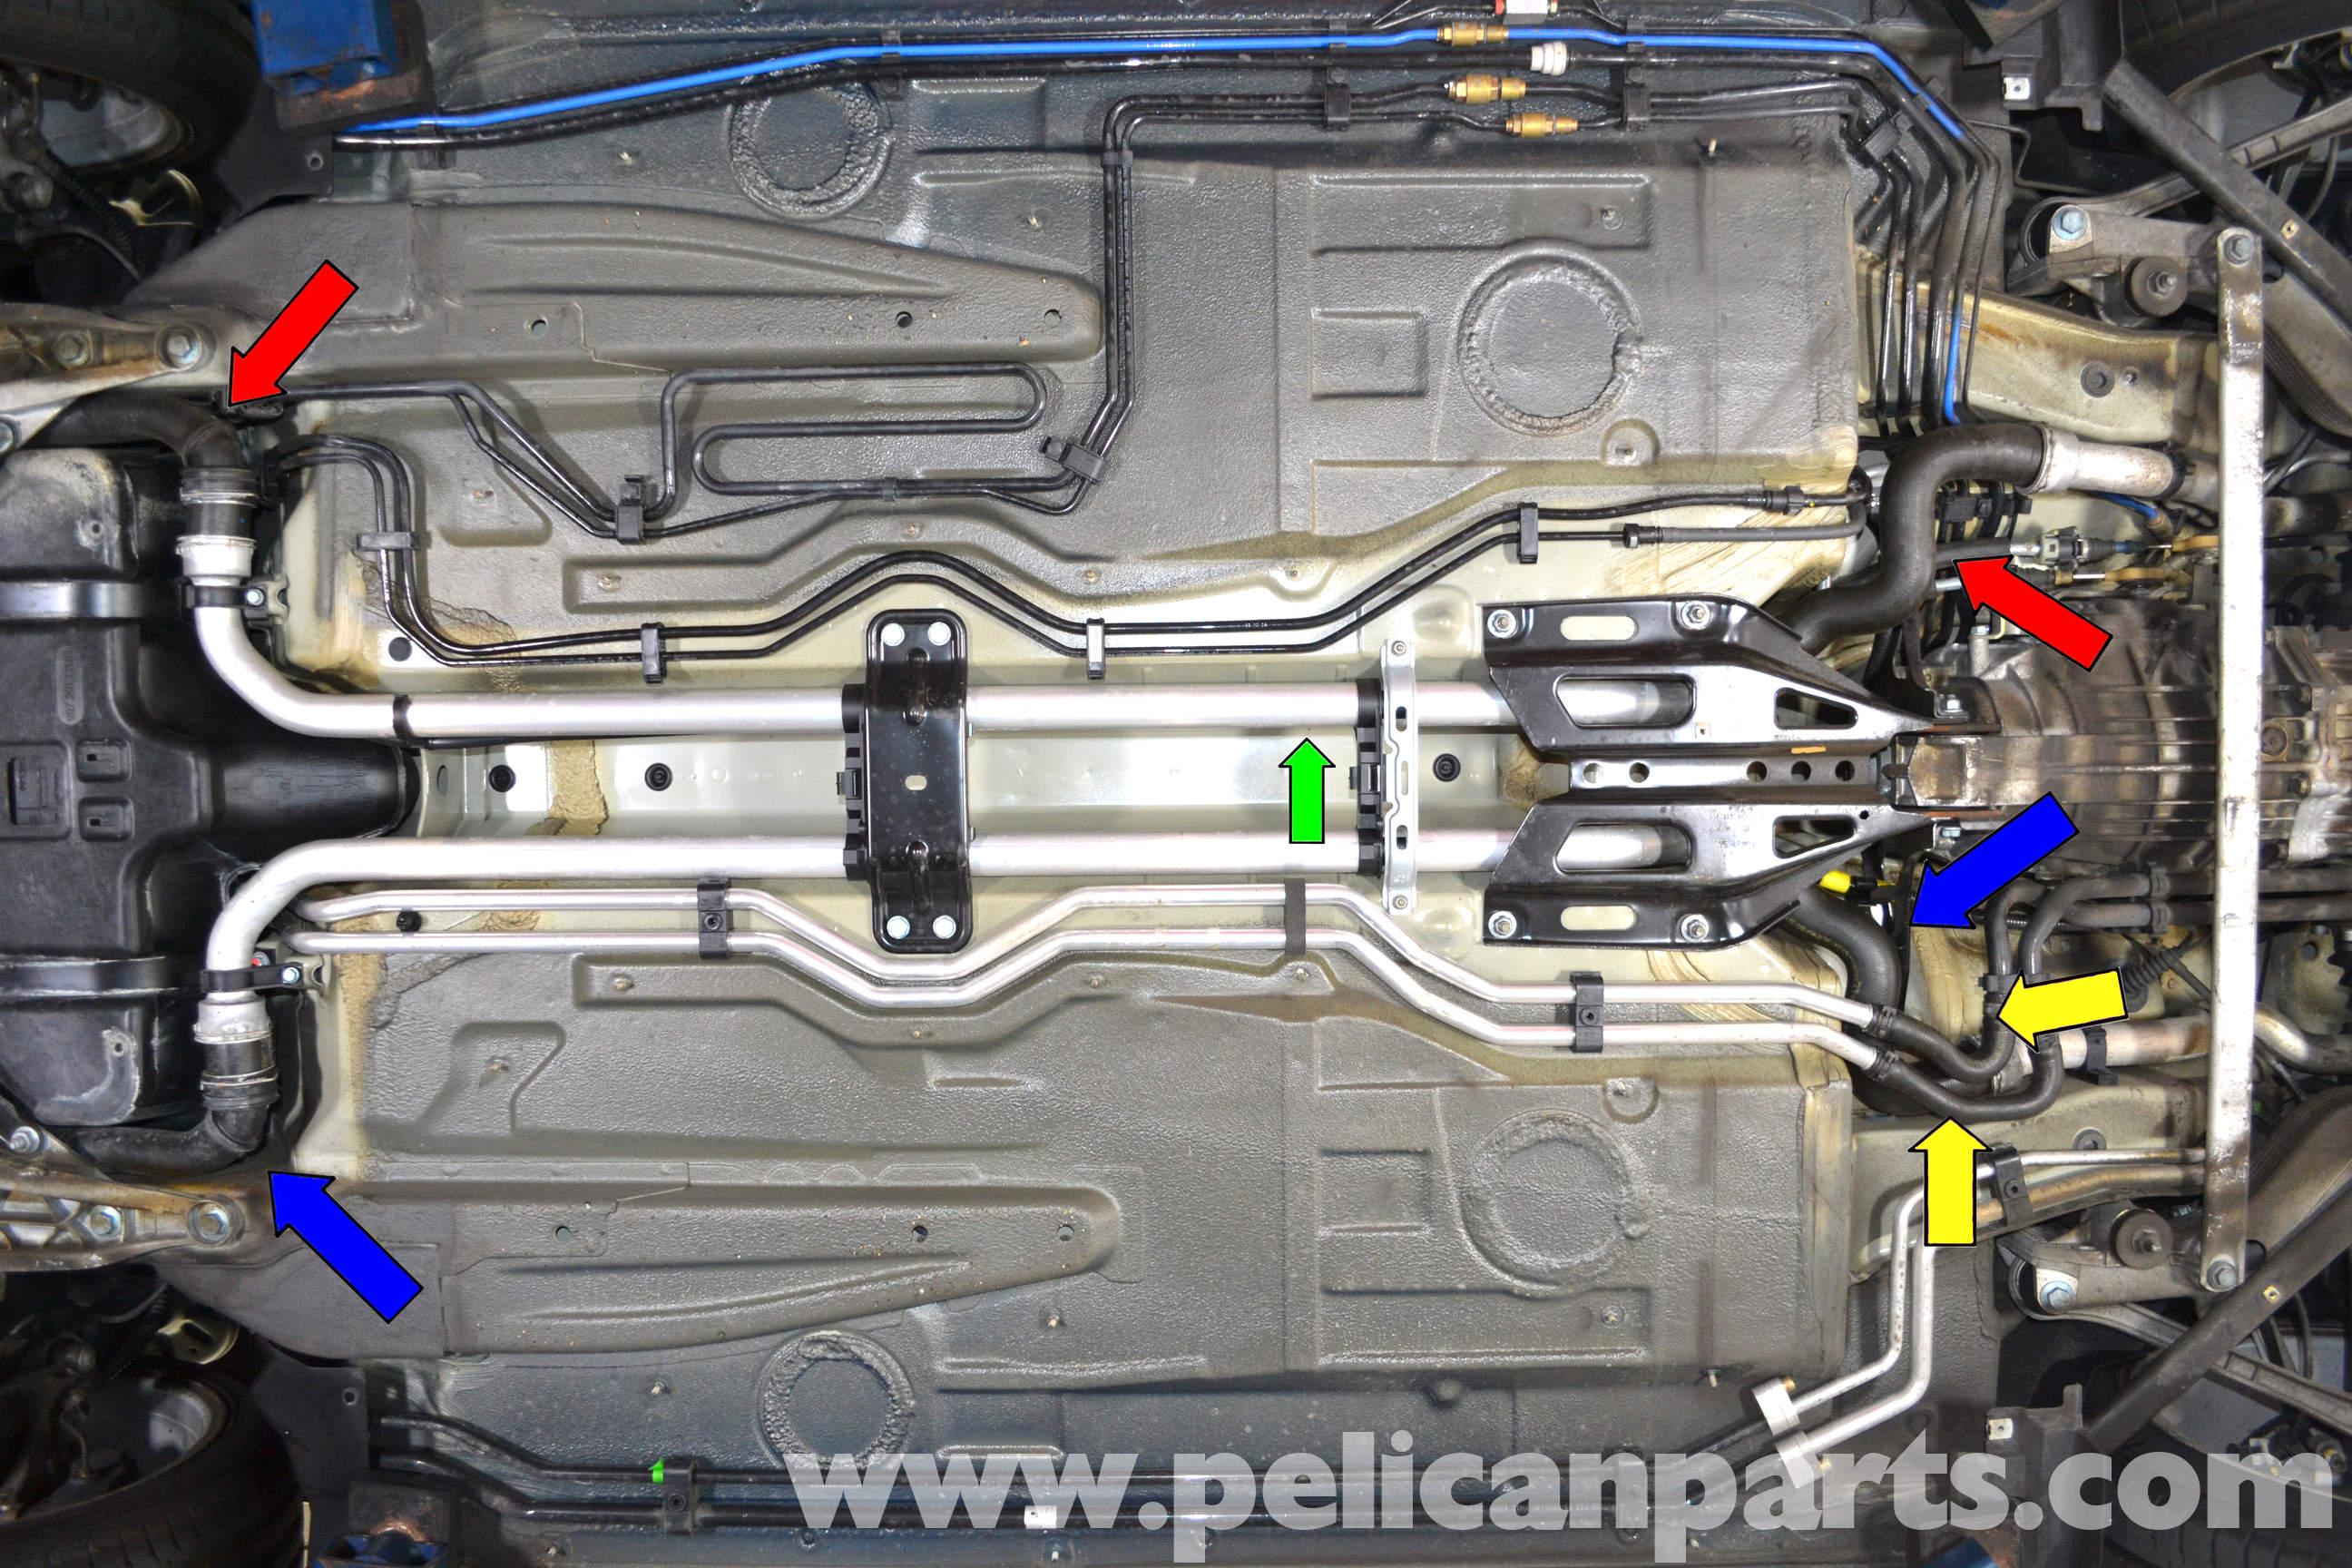 2003 Honda S2000 Fuel Filter Porsche 911 Carrera Coolant Hose Replacement 996 1998